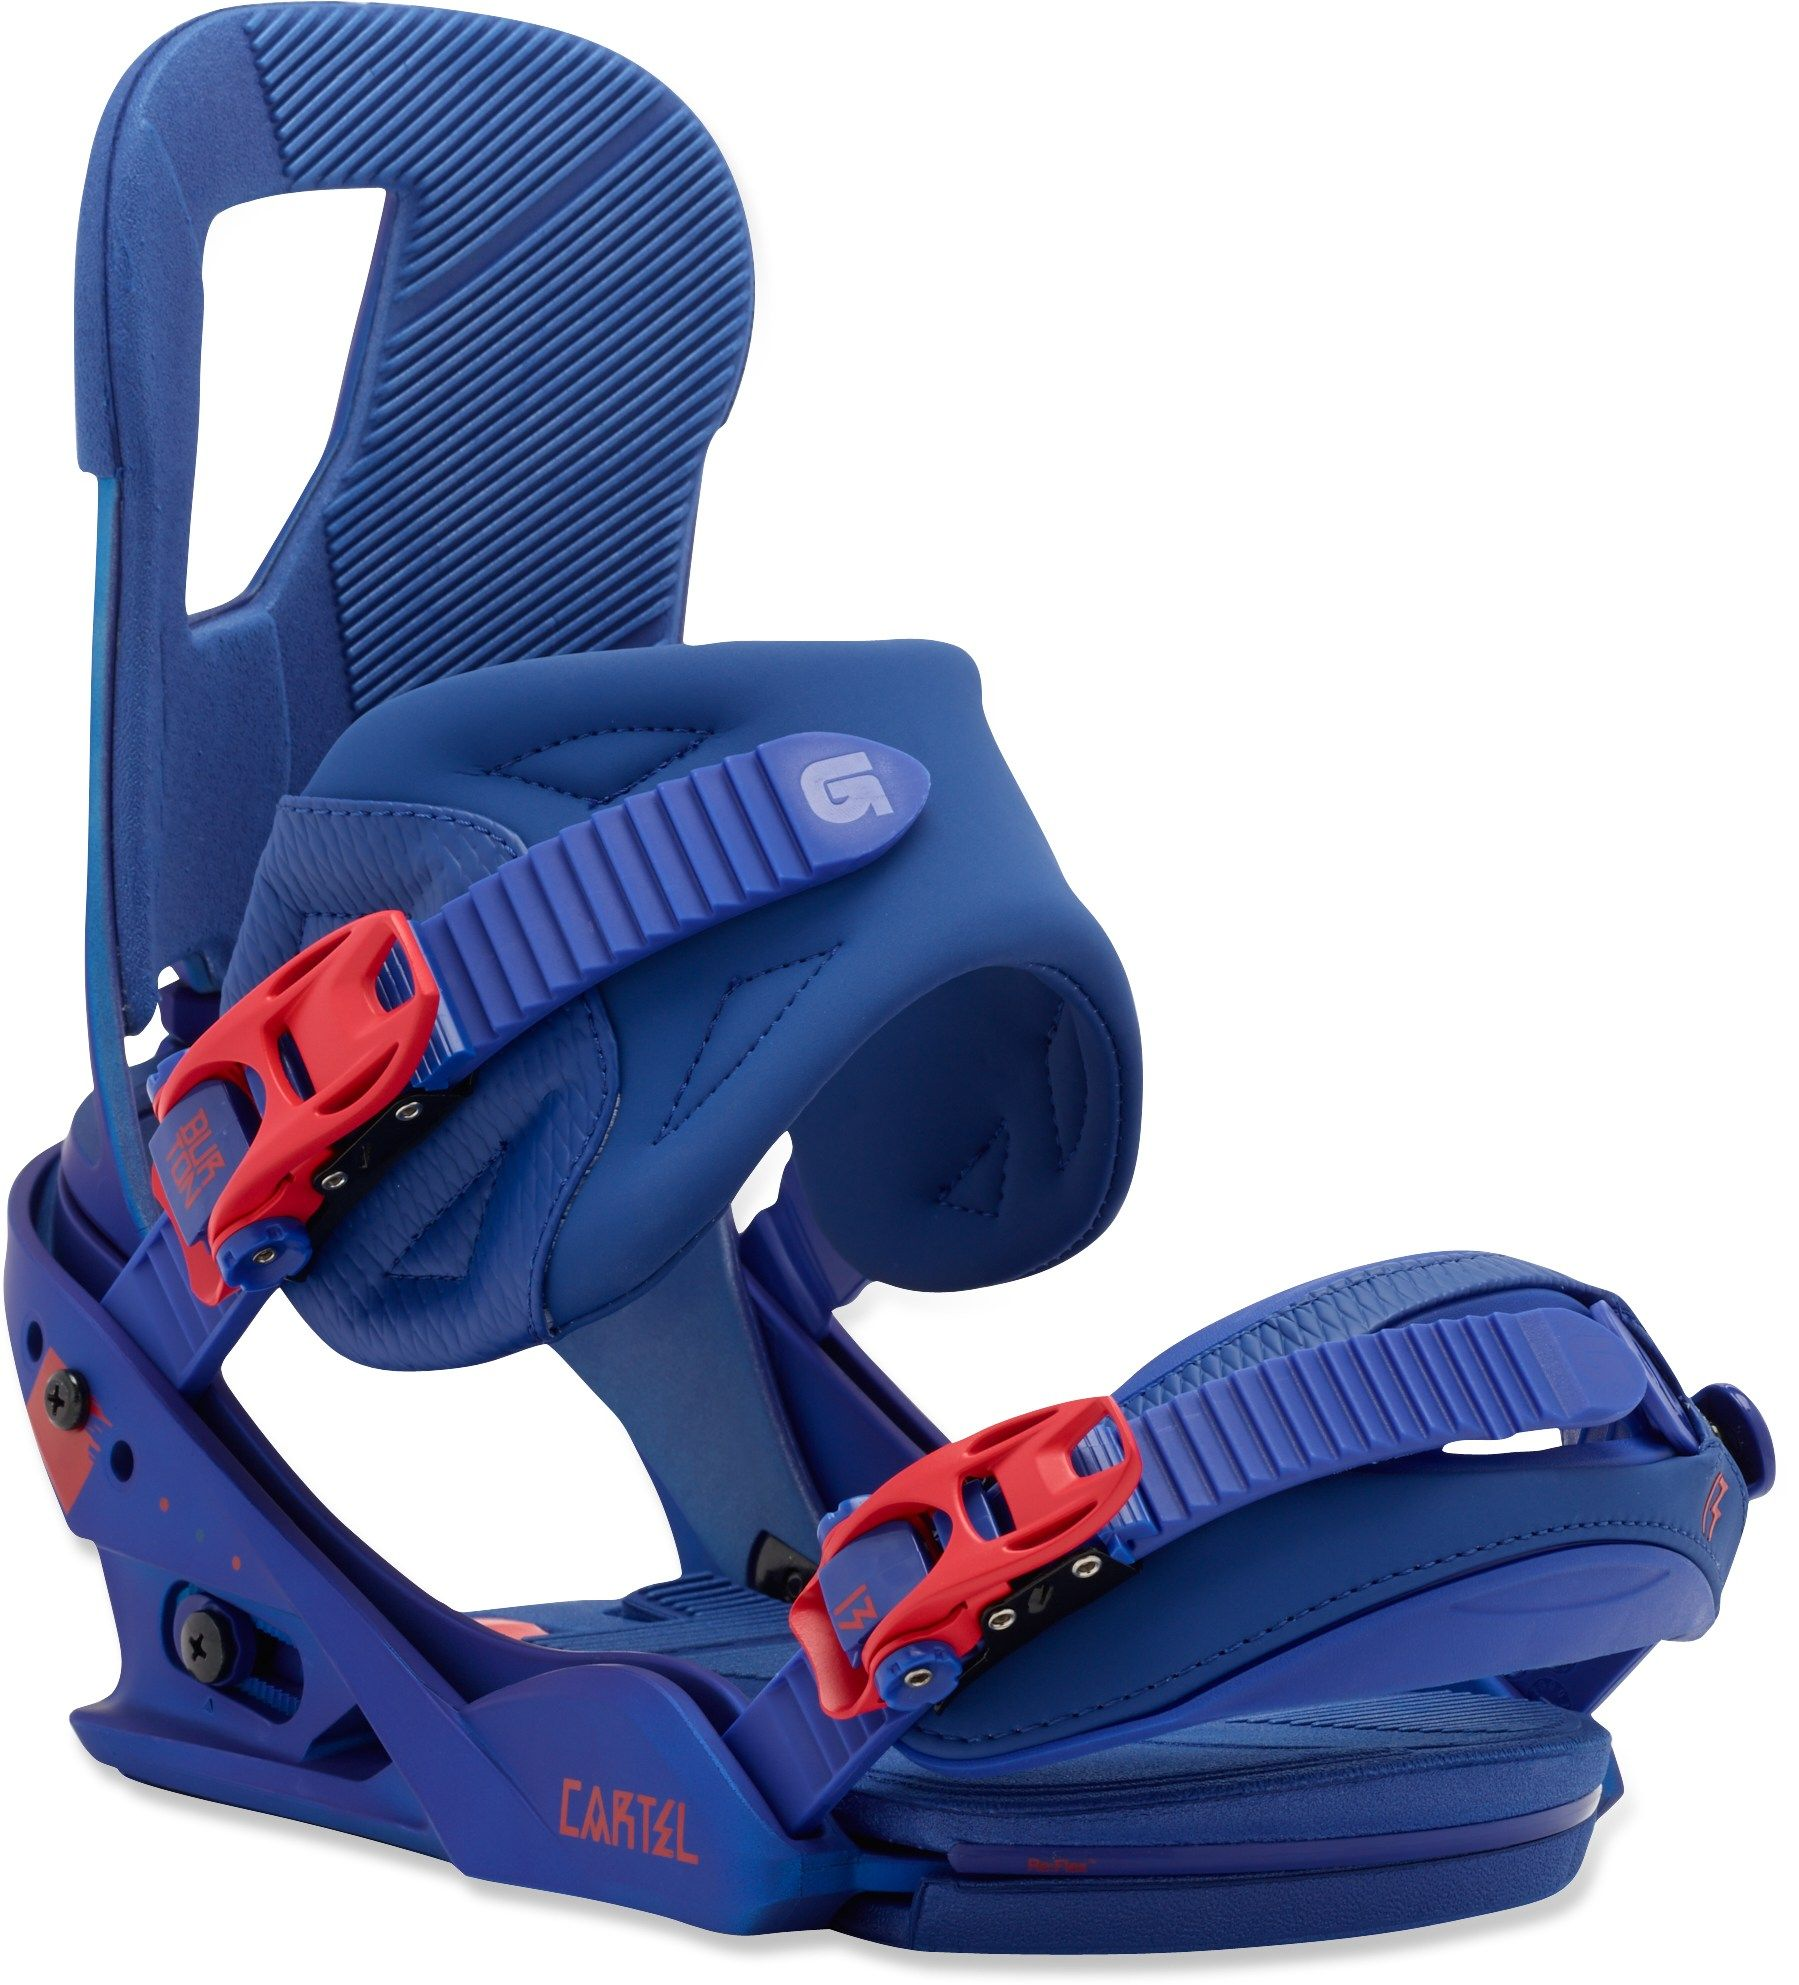 Burton Cartel Snowboard Bindings - 2014/2015